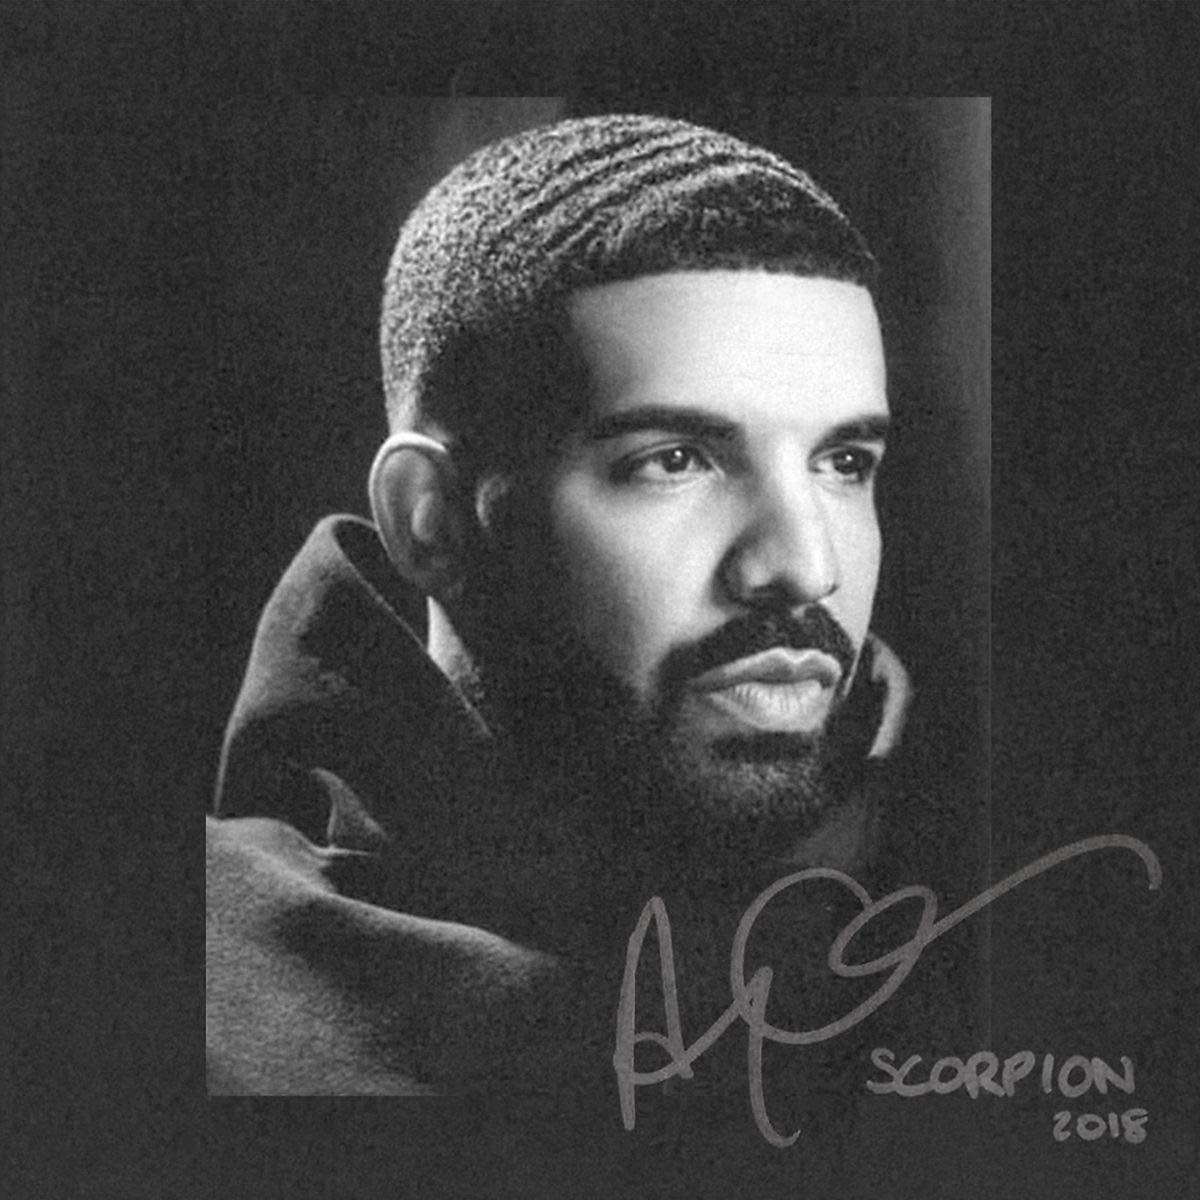 Drake - Scorpion Vinyl LP